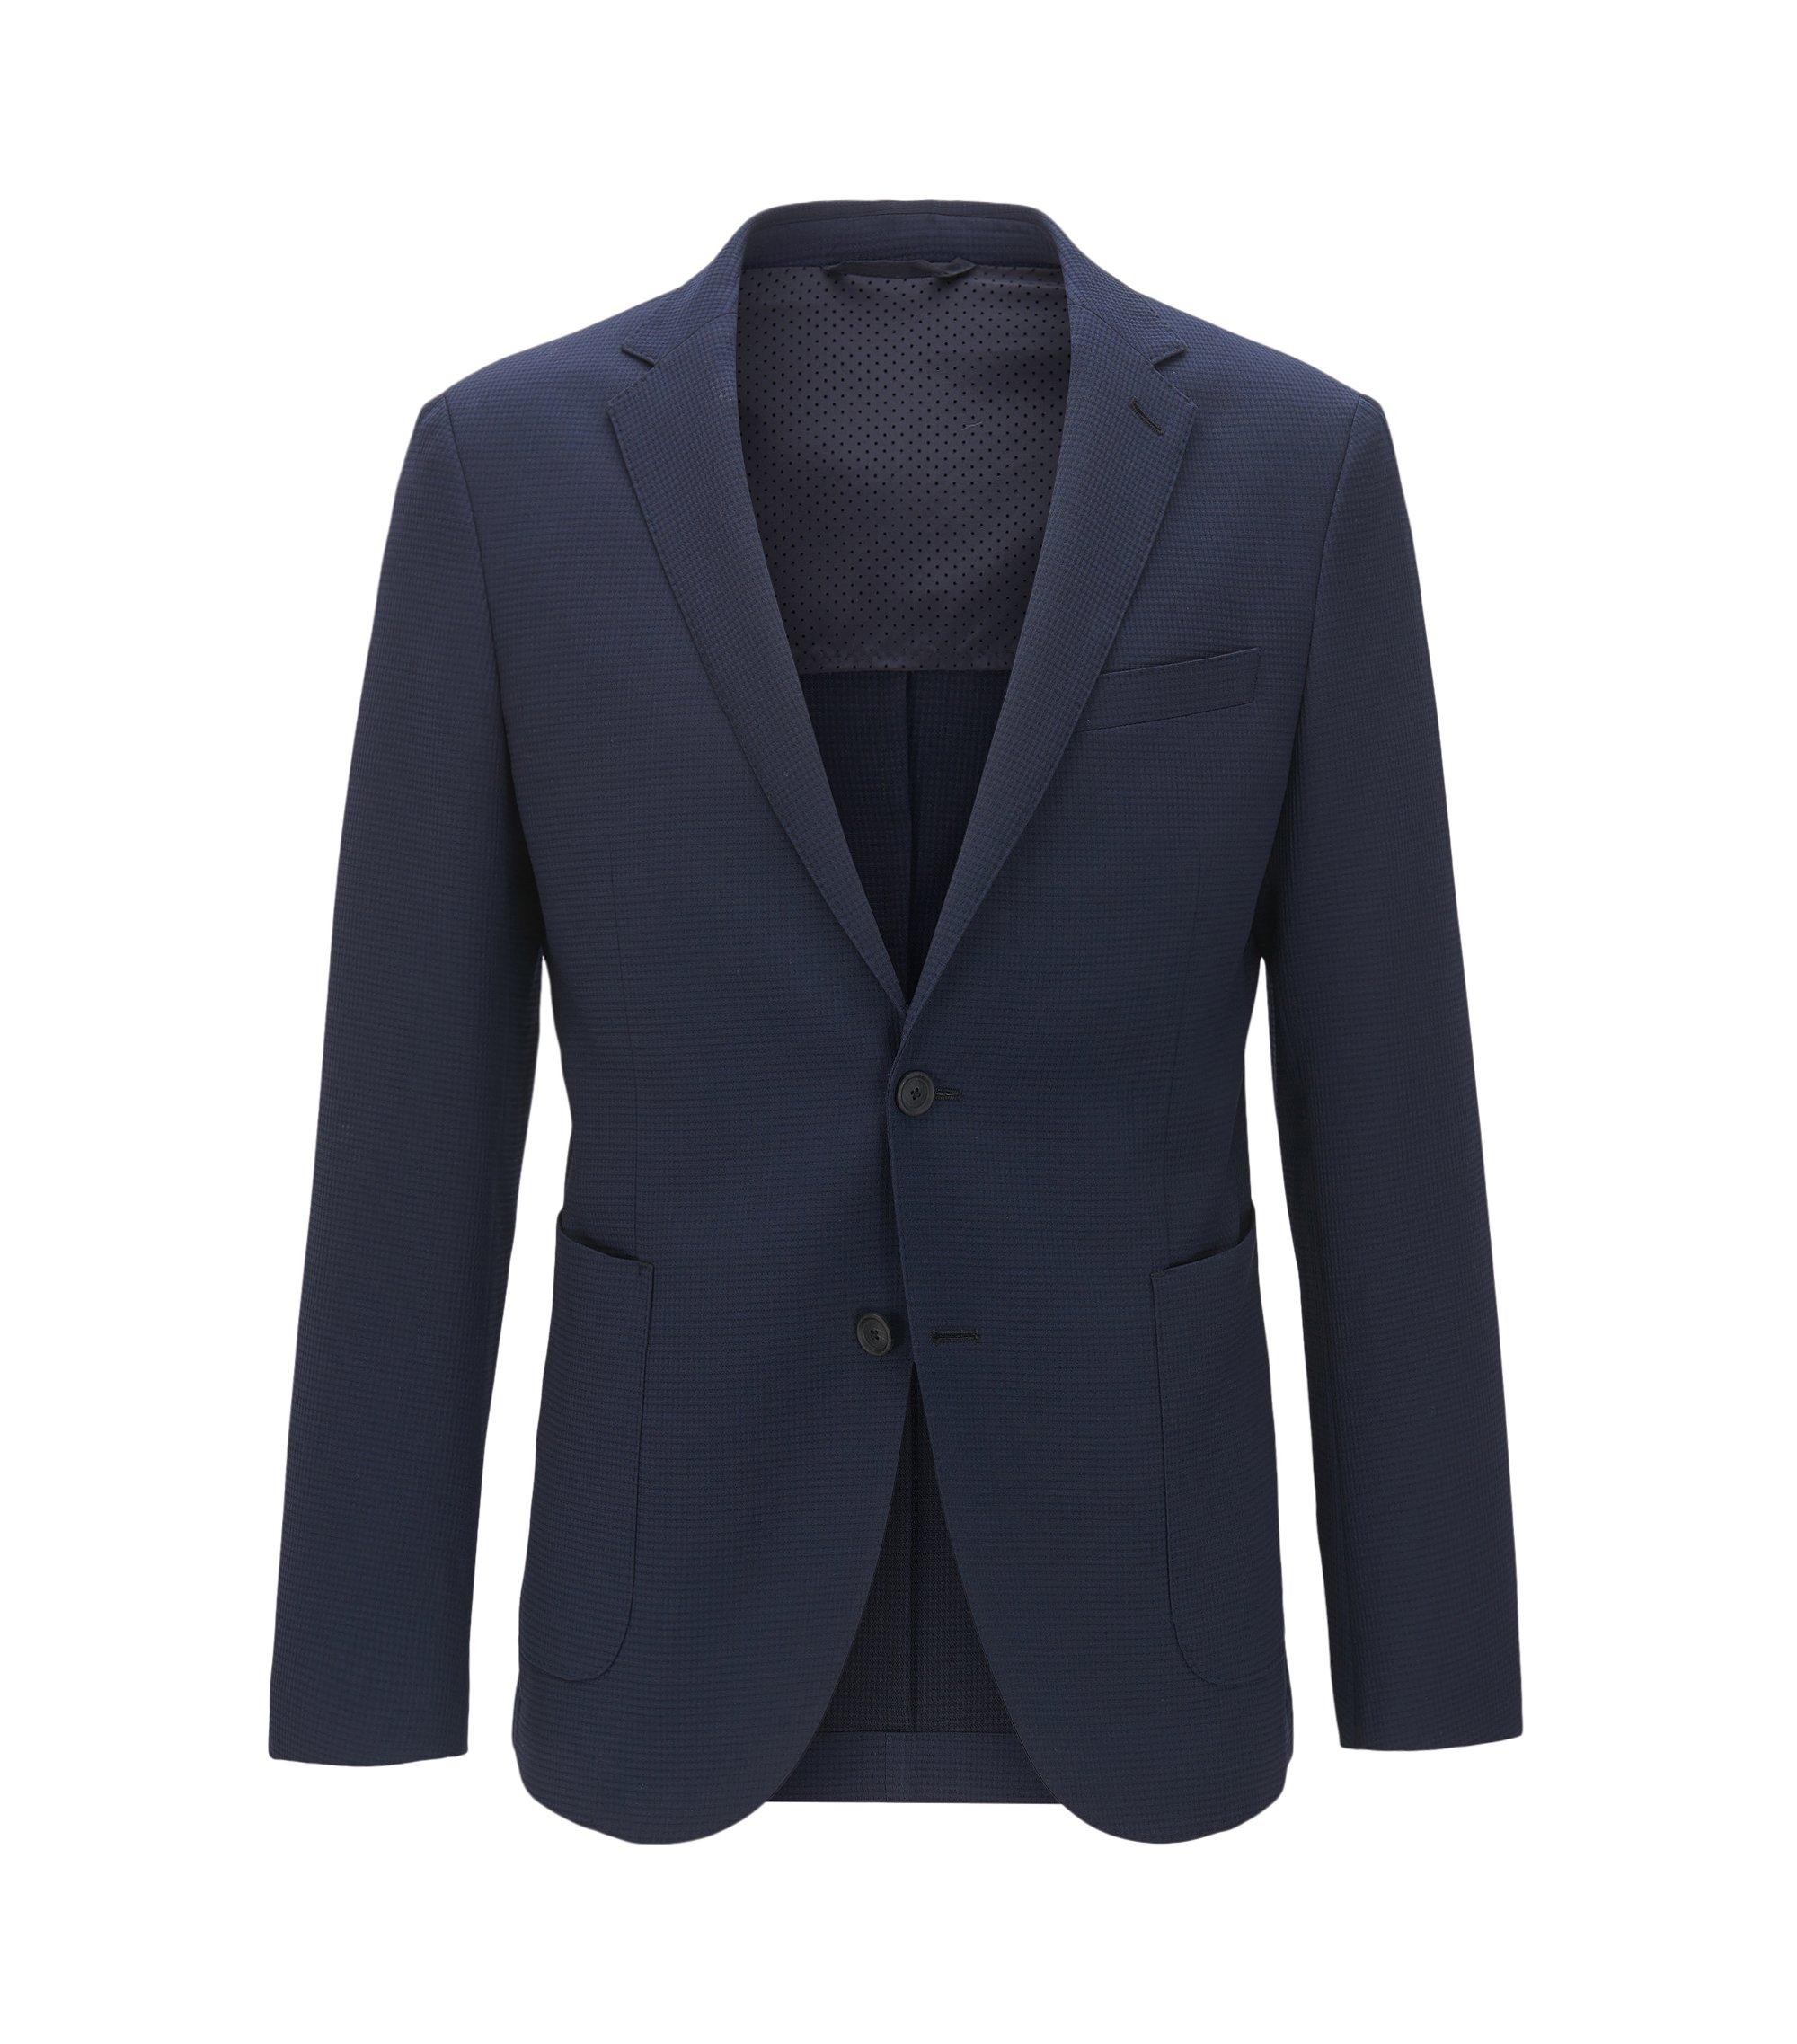 Virgin Wool Blend Sport Coat, Slim Fit | Nelven, Dark Blue